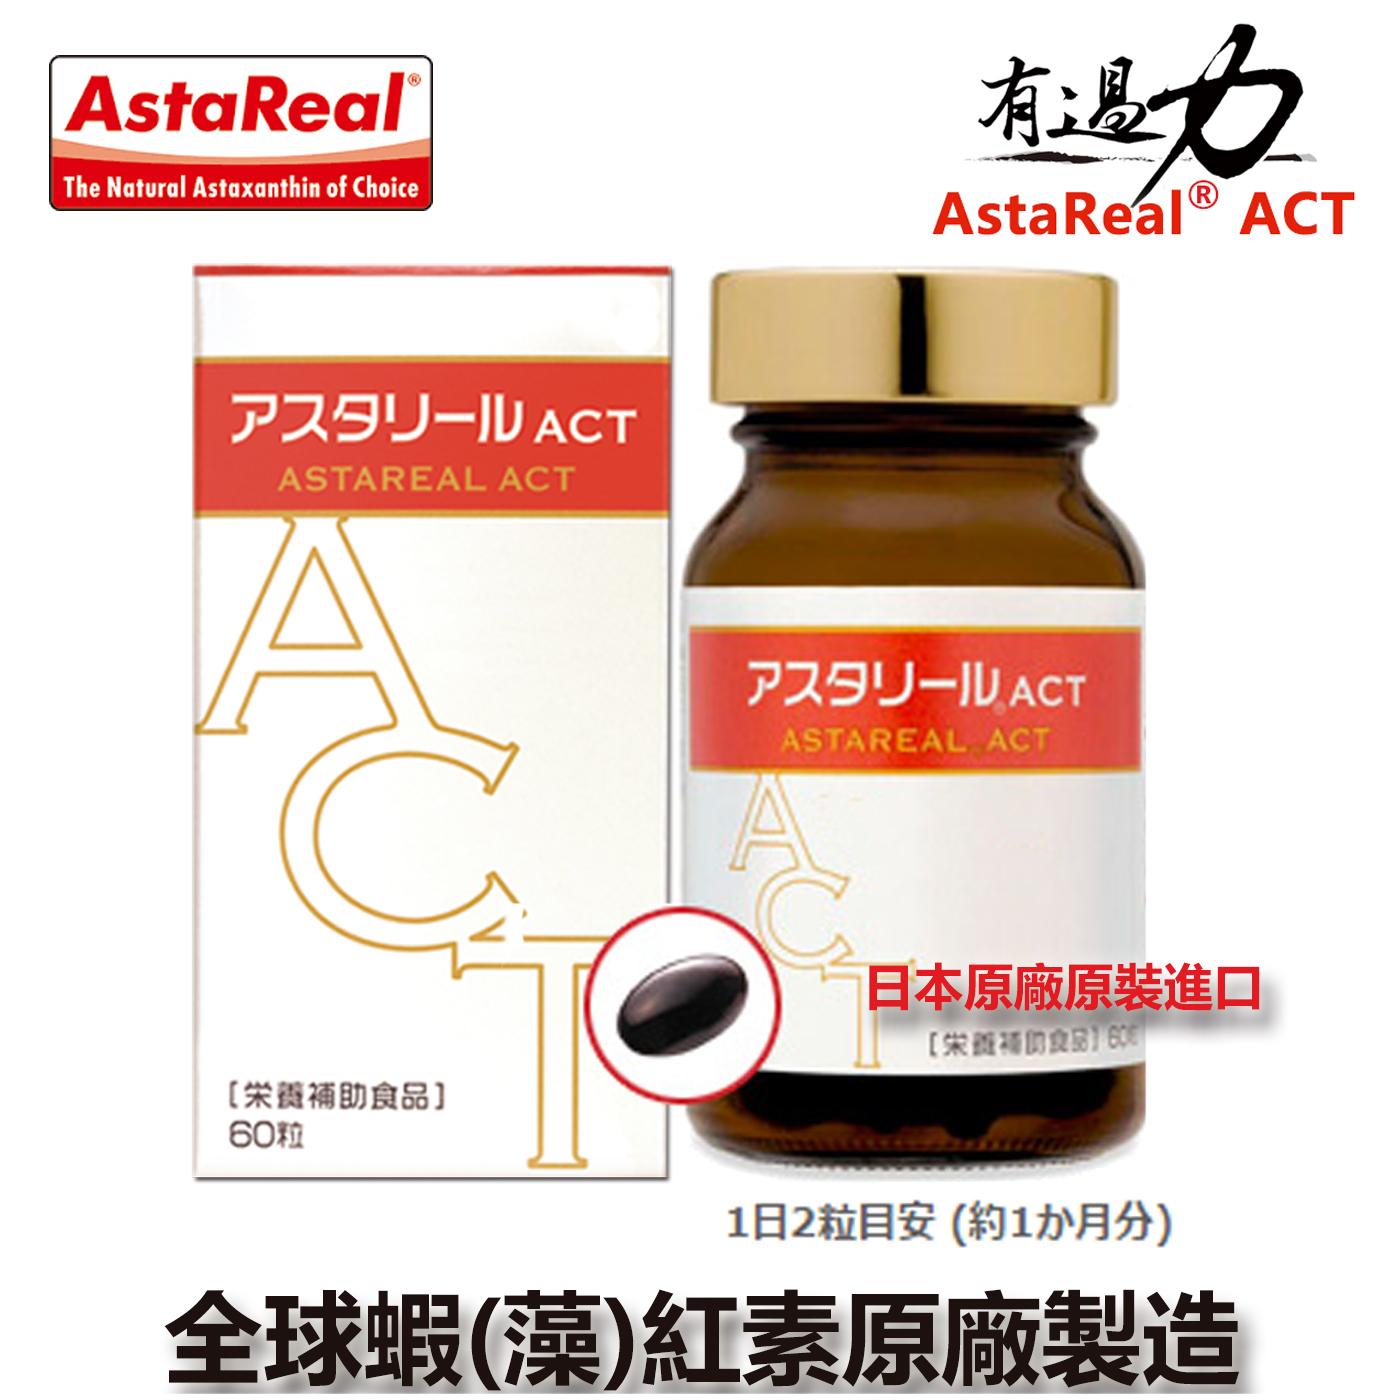 蝦紅素有過力《AstaReal® ACT》